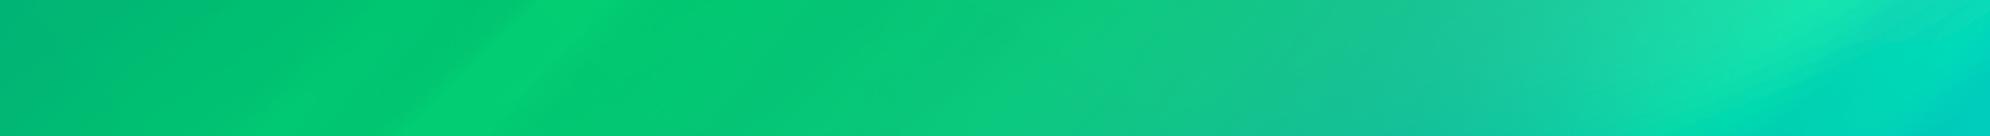 form_greenbar.png